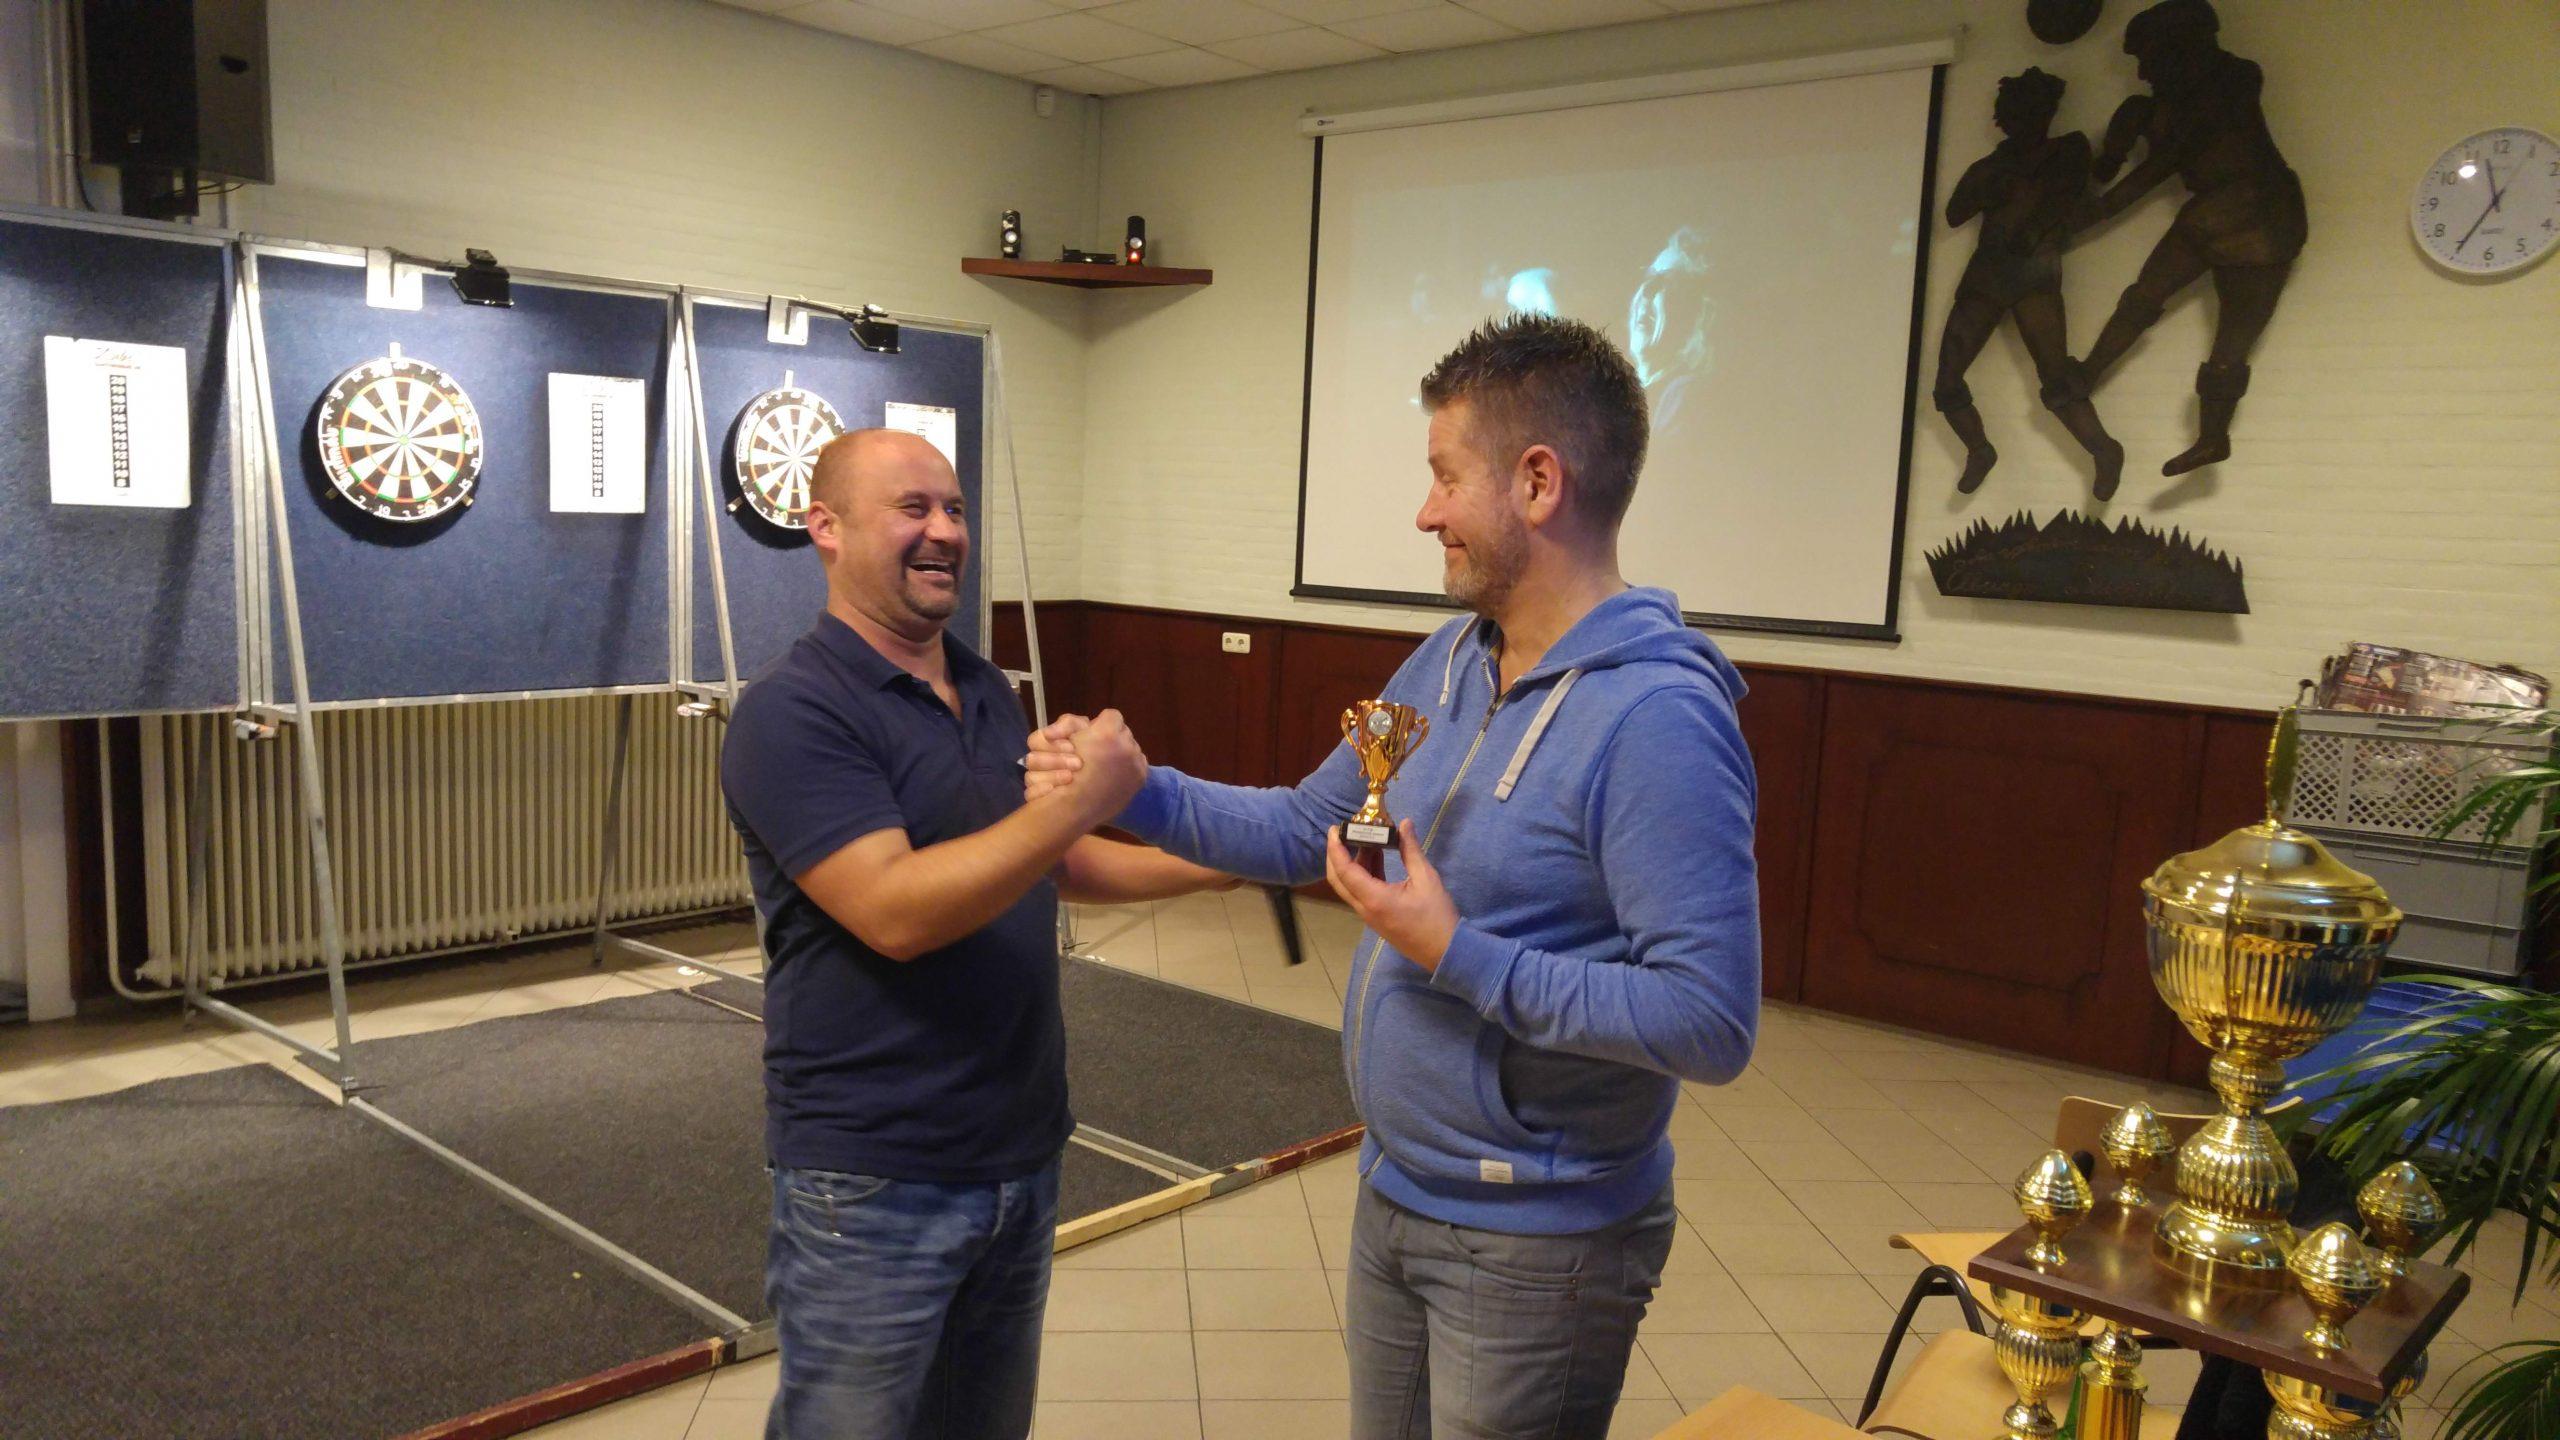 3e Gerrit Nagelhout Darttoernooi - Elburger SC